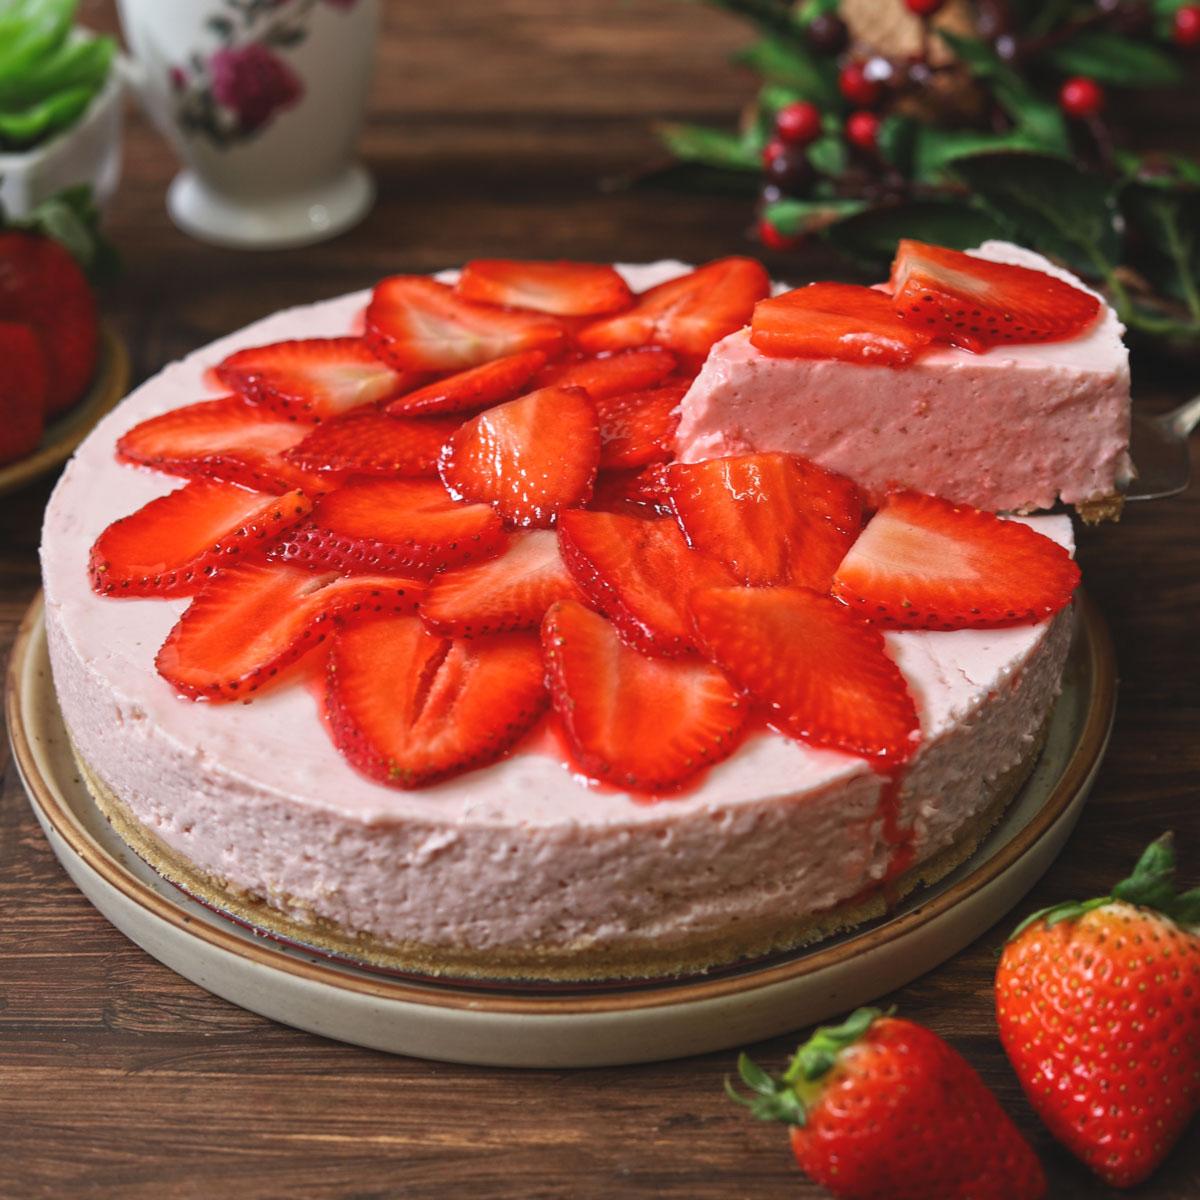 No Bake Strawberry Cheesecake (Video Recipe)